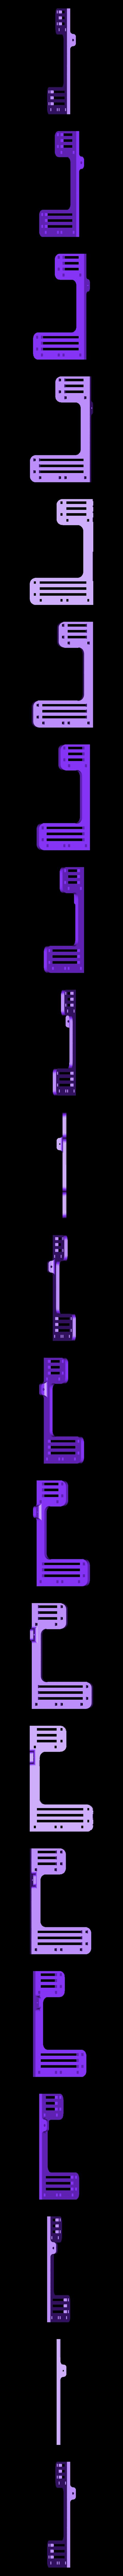 Etagere epices cote gauche.STL Download free STL file Spice wall shelf • 3D printer design, Thibaud_